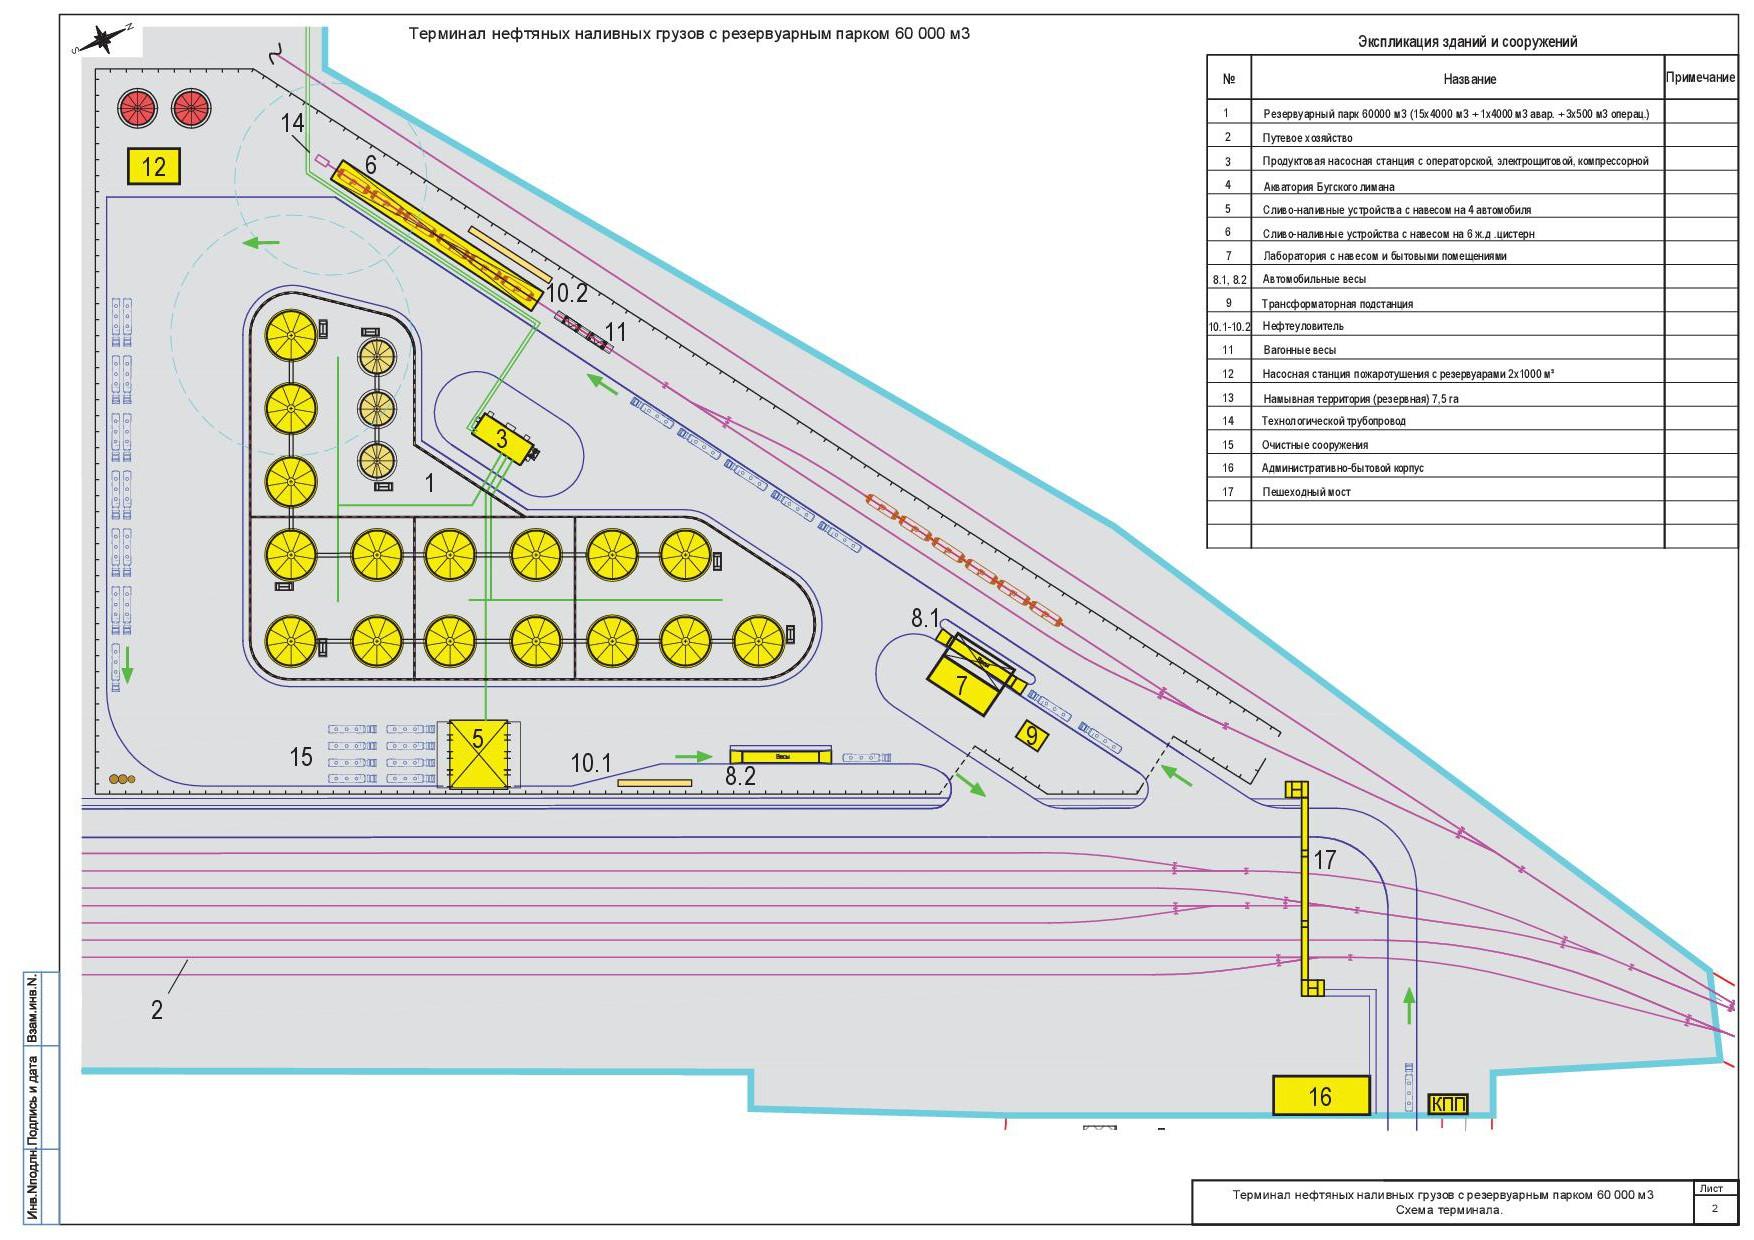 Налив. Океан (2020-03-16) Layout Shipyard2